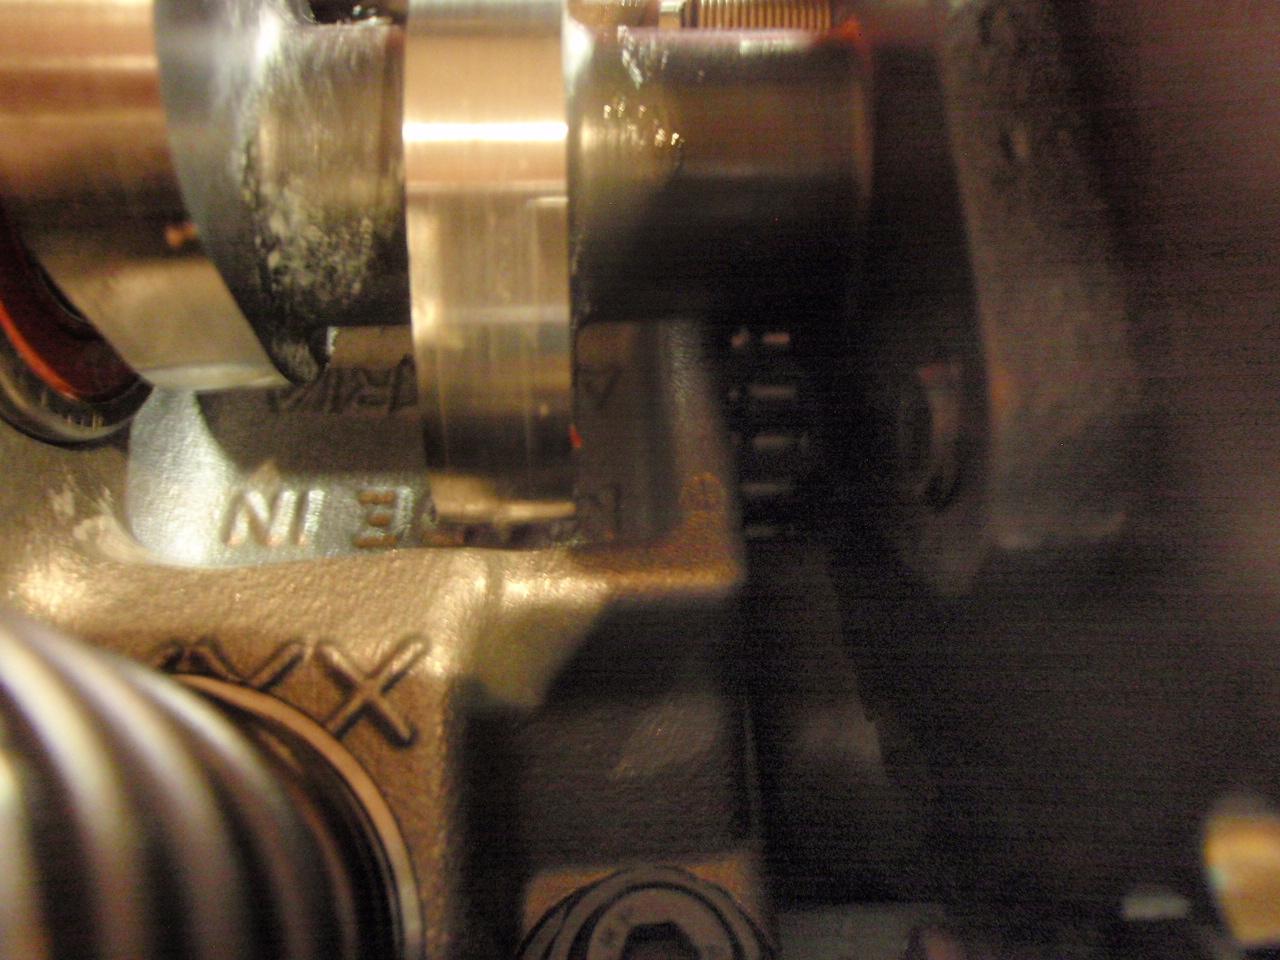 8/07 cam install - gotta grind the head for clearance-pc092082.jpg